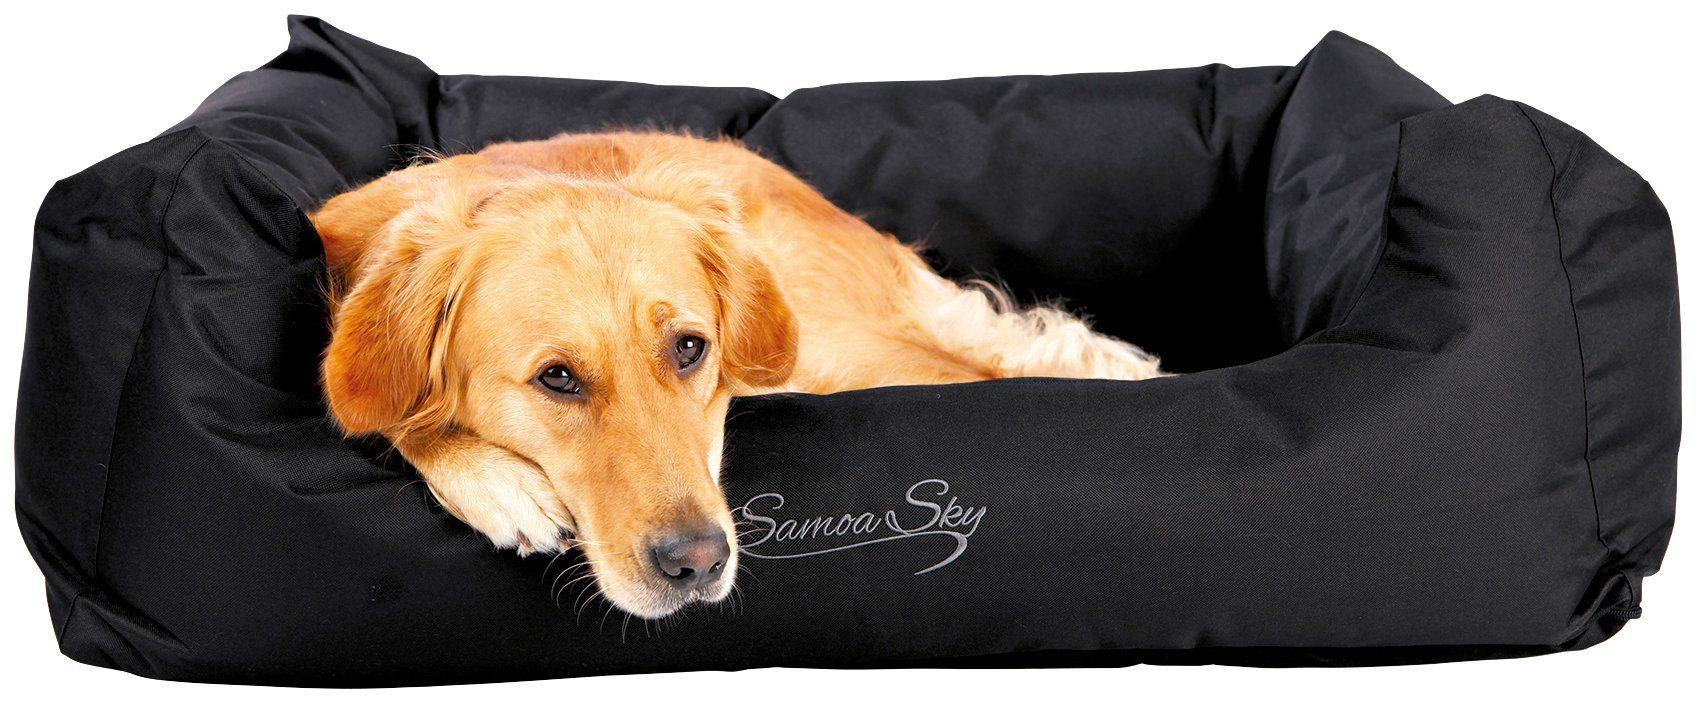 Hunde-Bett »Samoa Sky«, BxL: 65x50 cm, schwarz